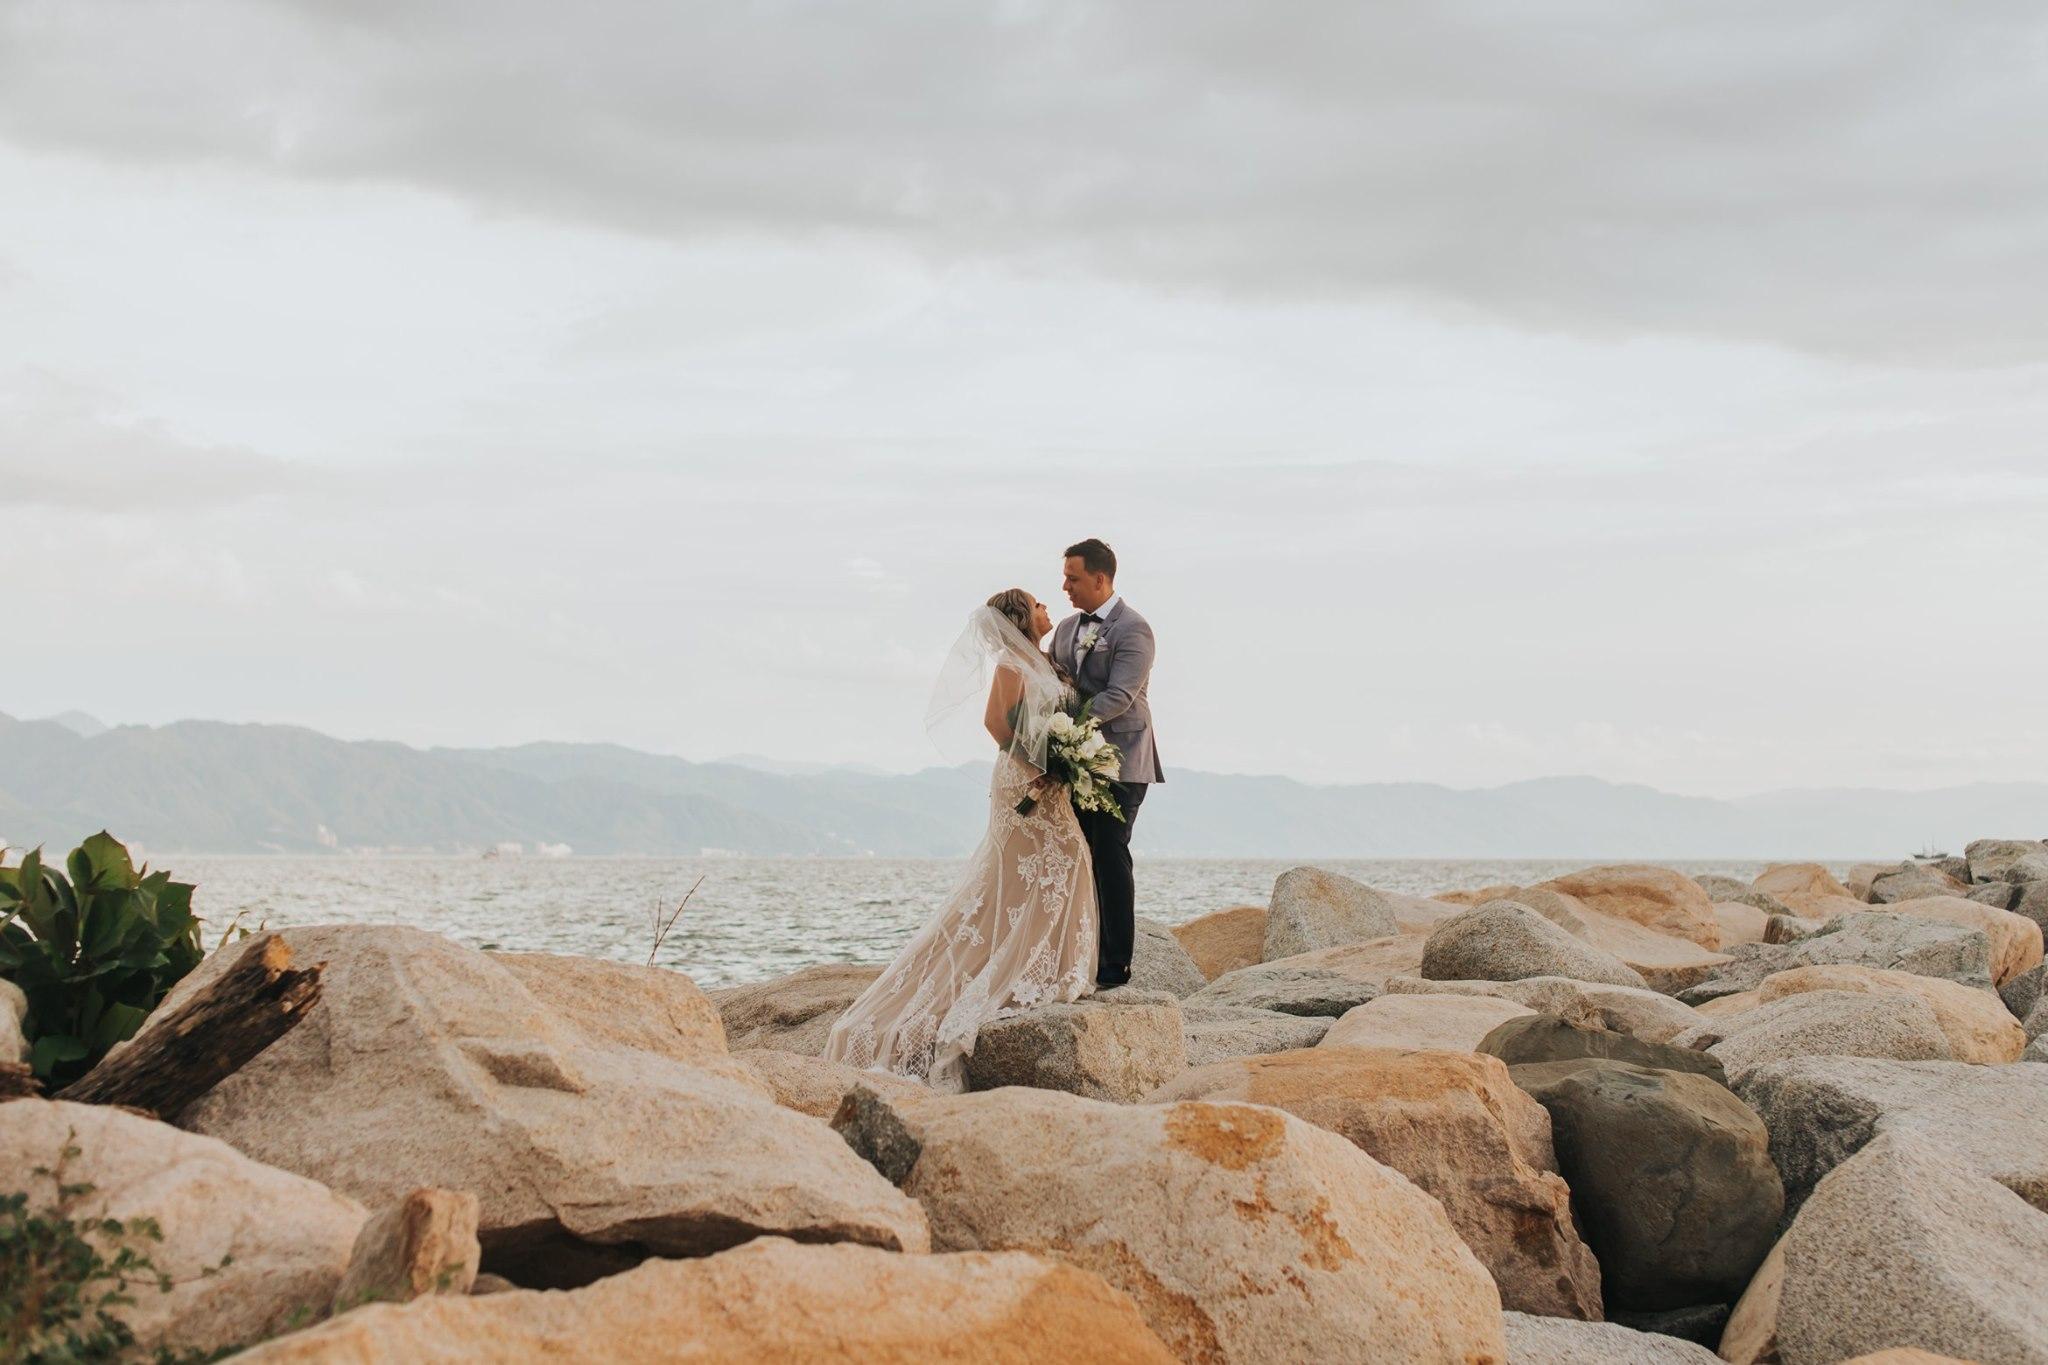 oke wedding photo locations